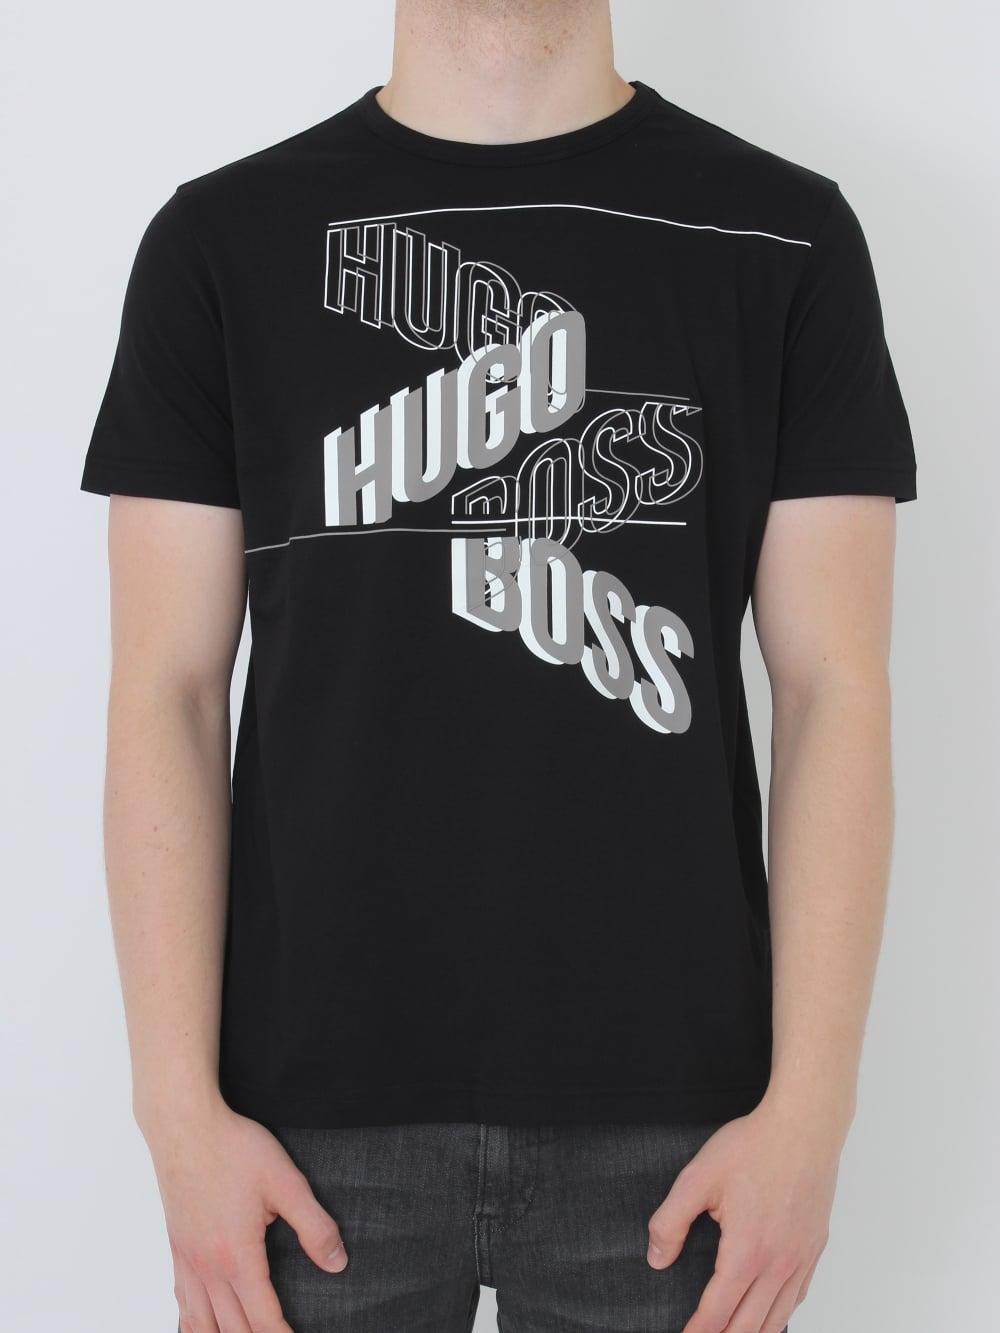 9eb653919d HUGO BOSS - BOSS Green Tee 2 Printed T.Shirt in Black - Northern Threads